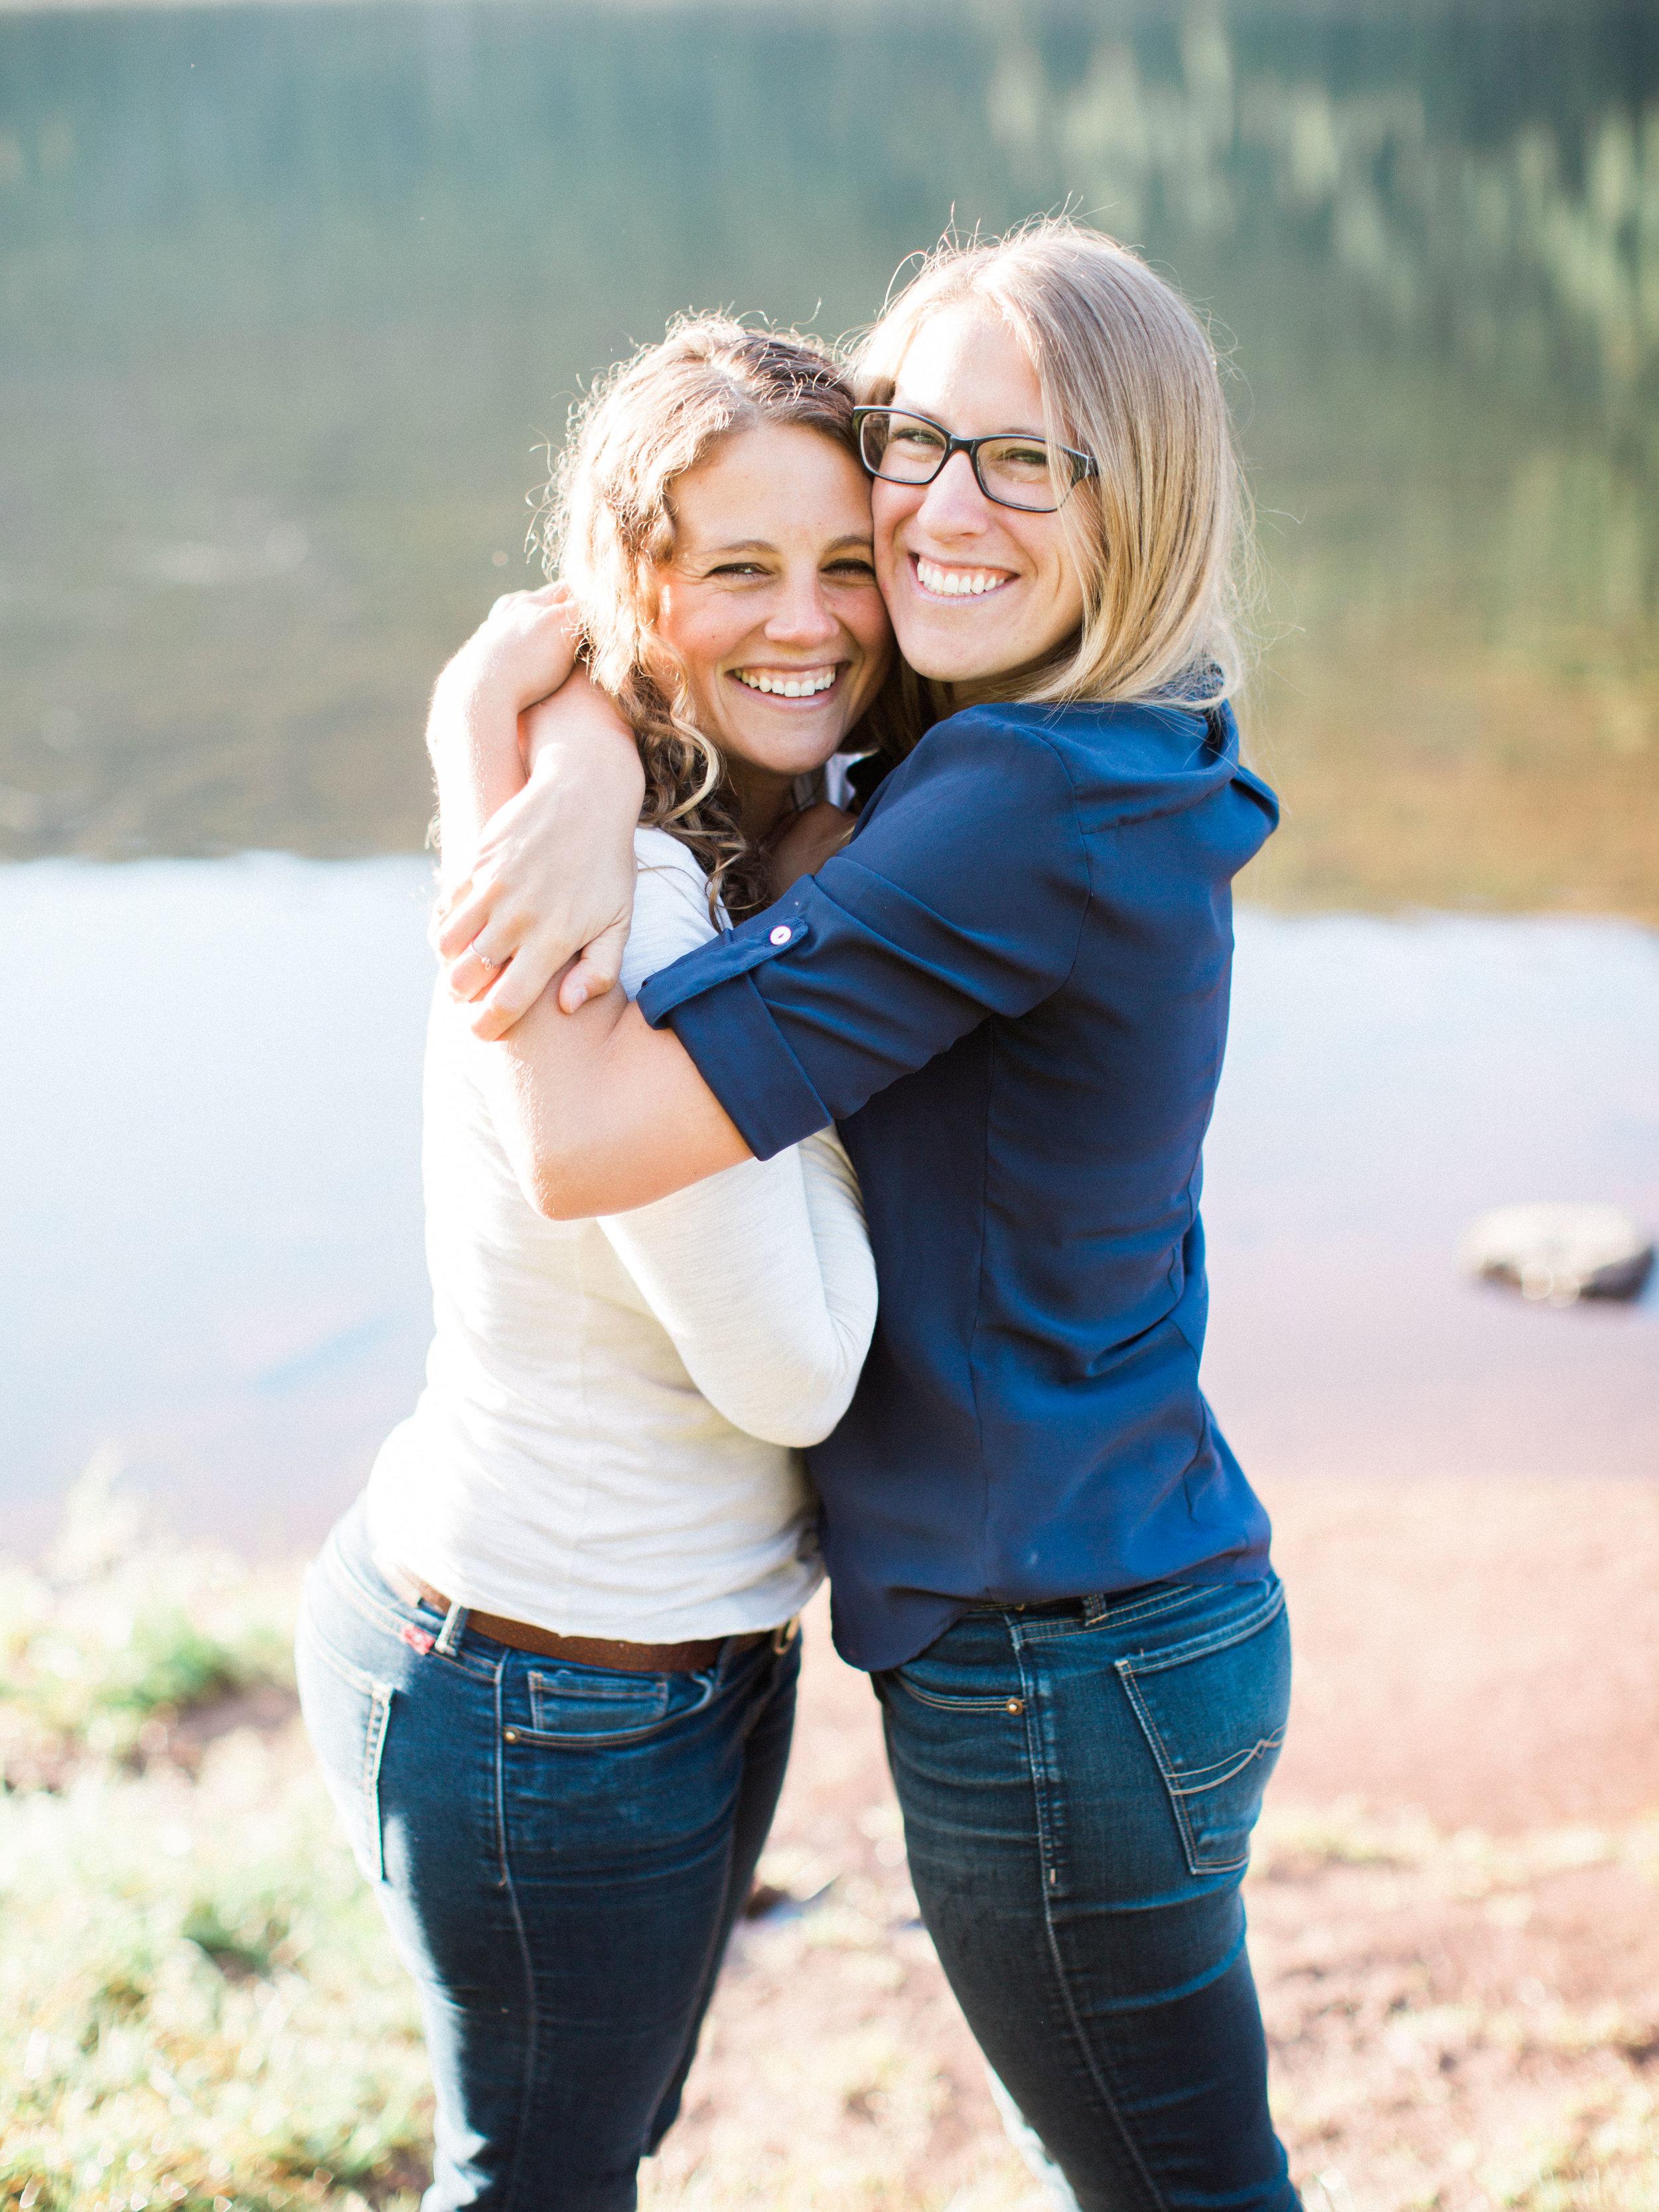 jessica & Haley | Boulder, CO